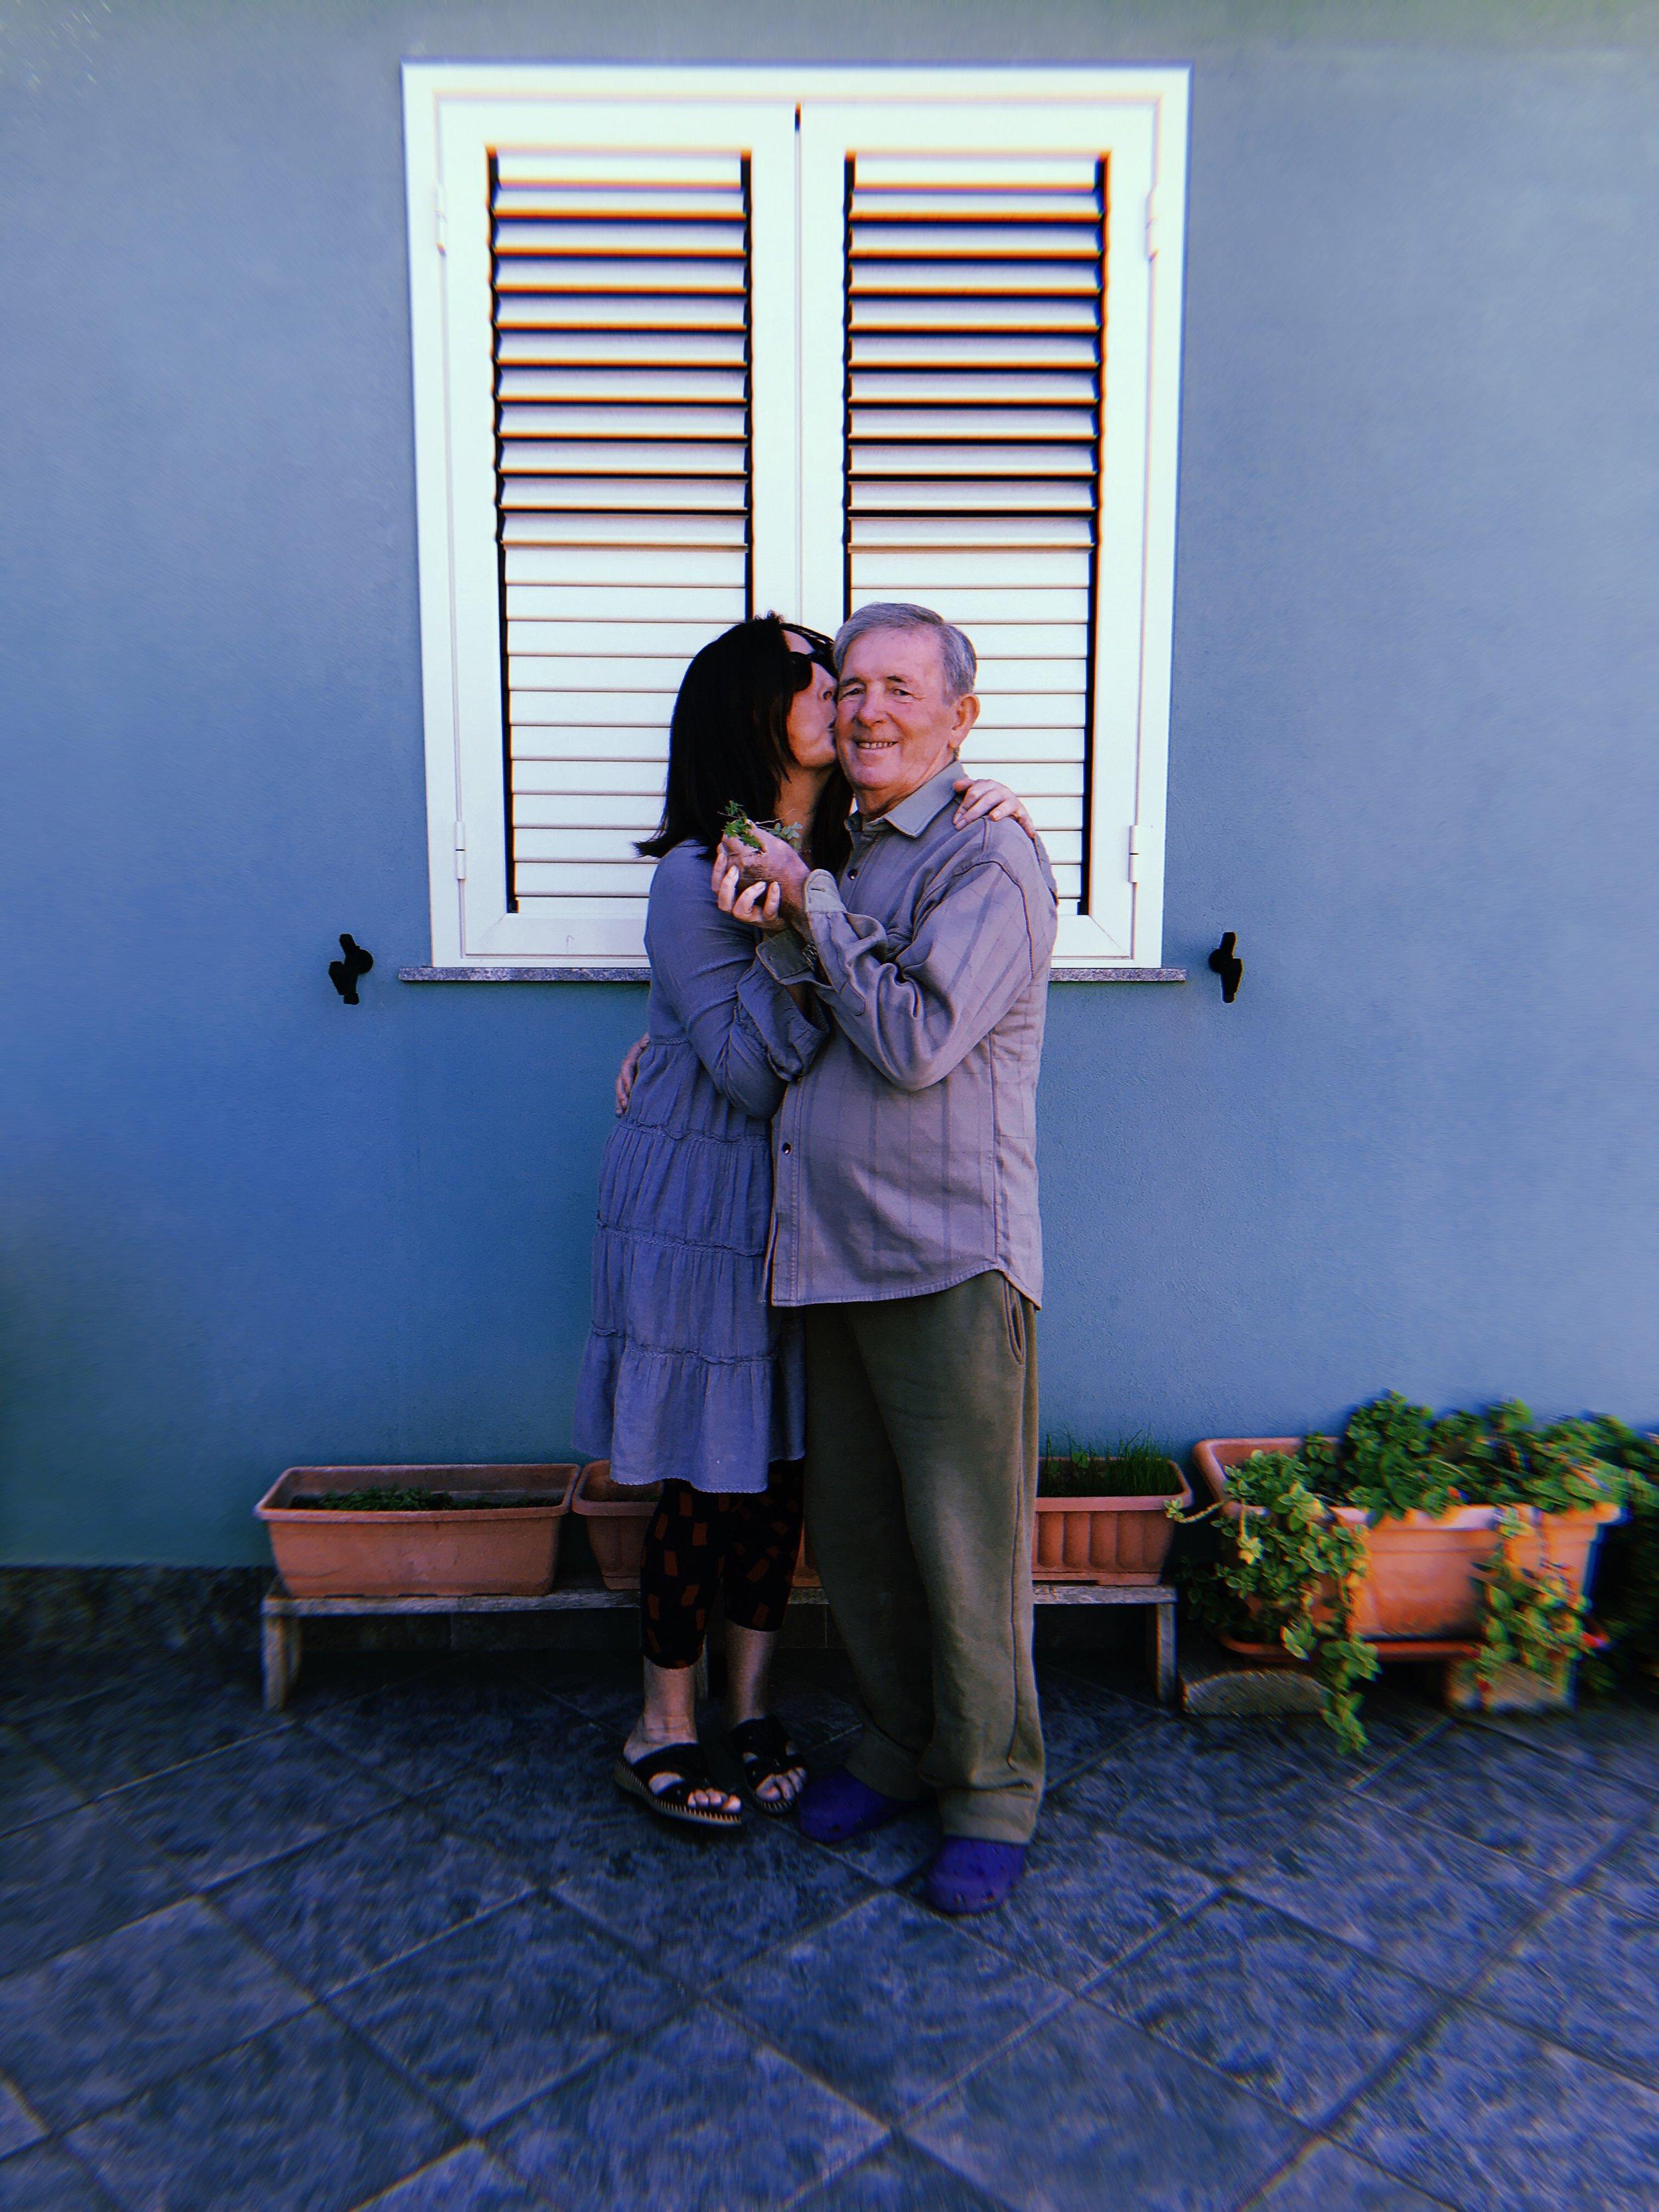 Doriana and Massimo Pagani, Lido di Noto — November 2018.